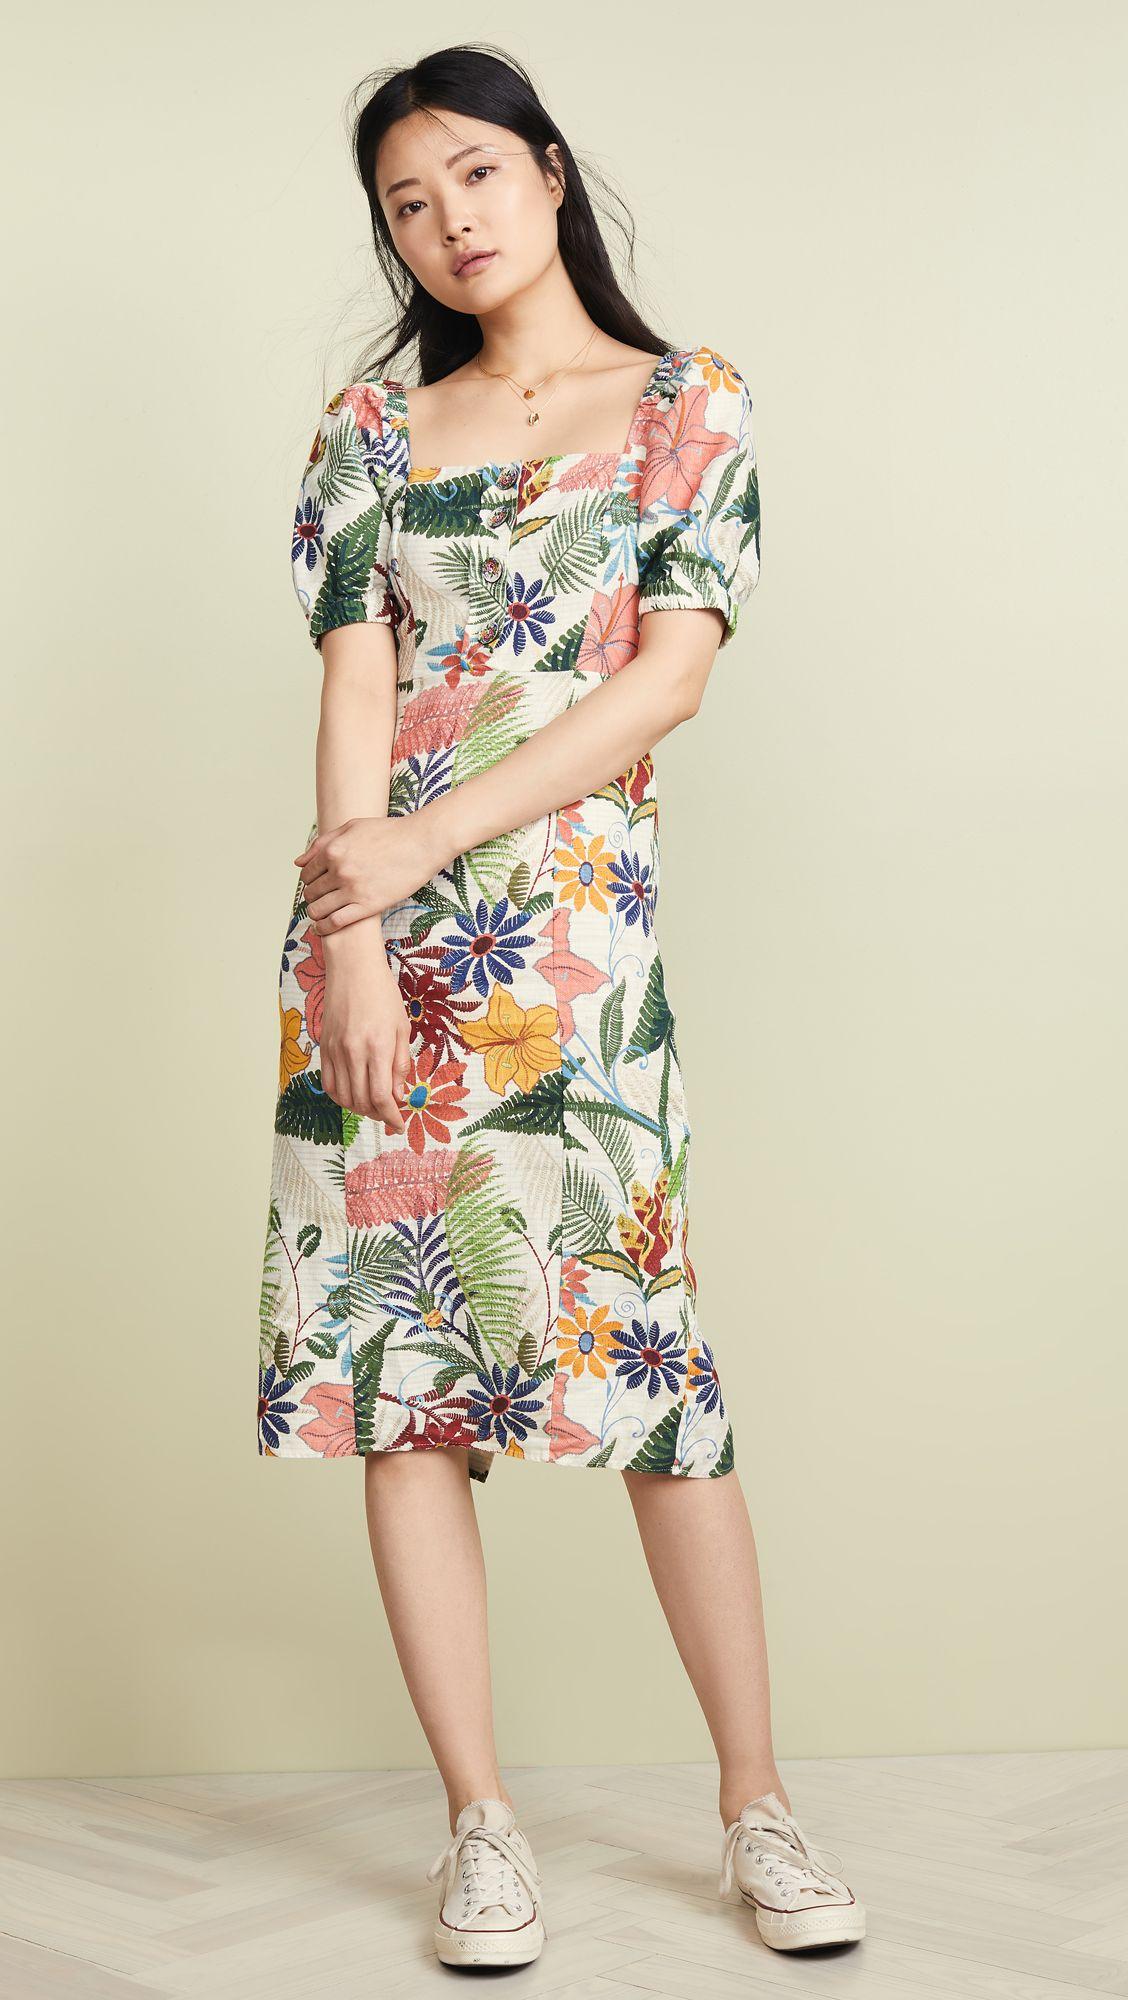 Vintage Garden Midi Puffed Sleeve Dress With Images Puff Sleeve Dresses Dresses With Sleeves